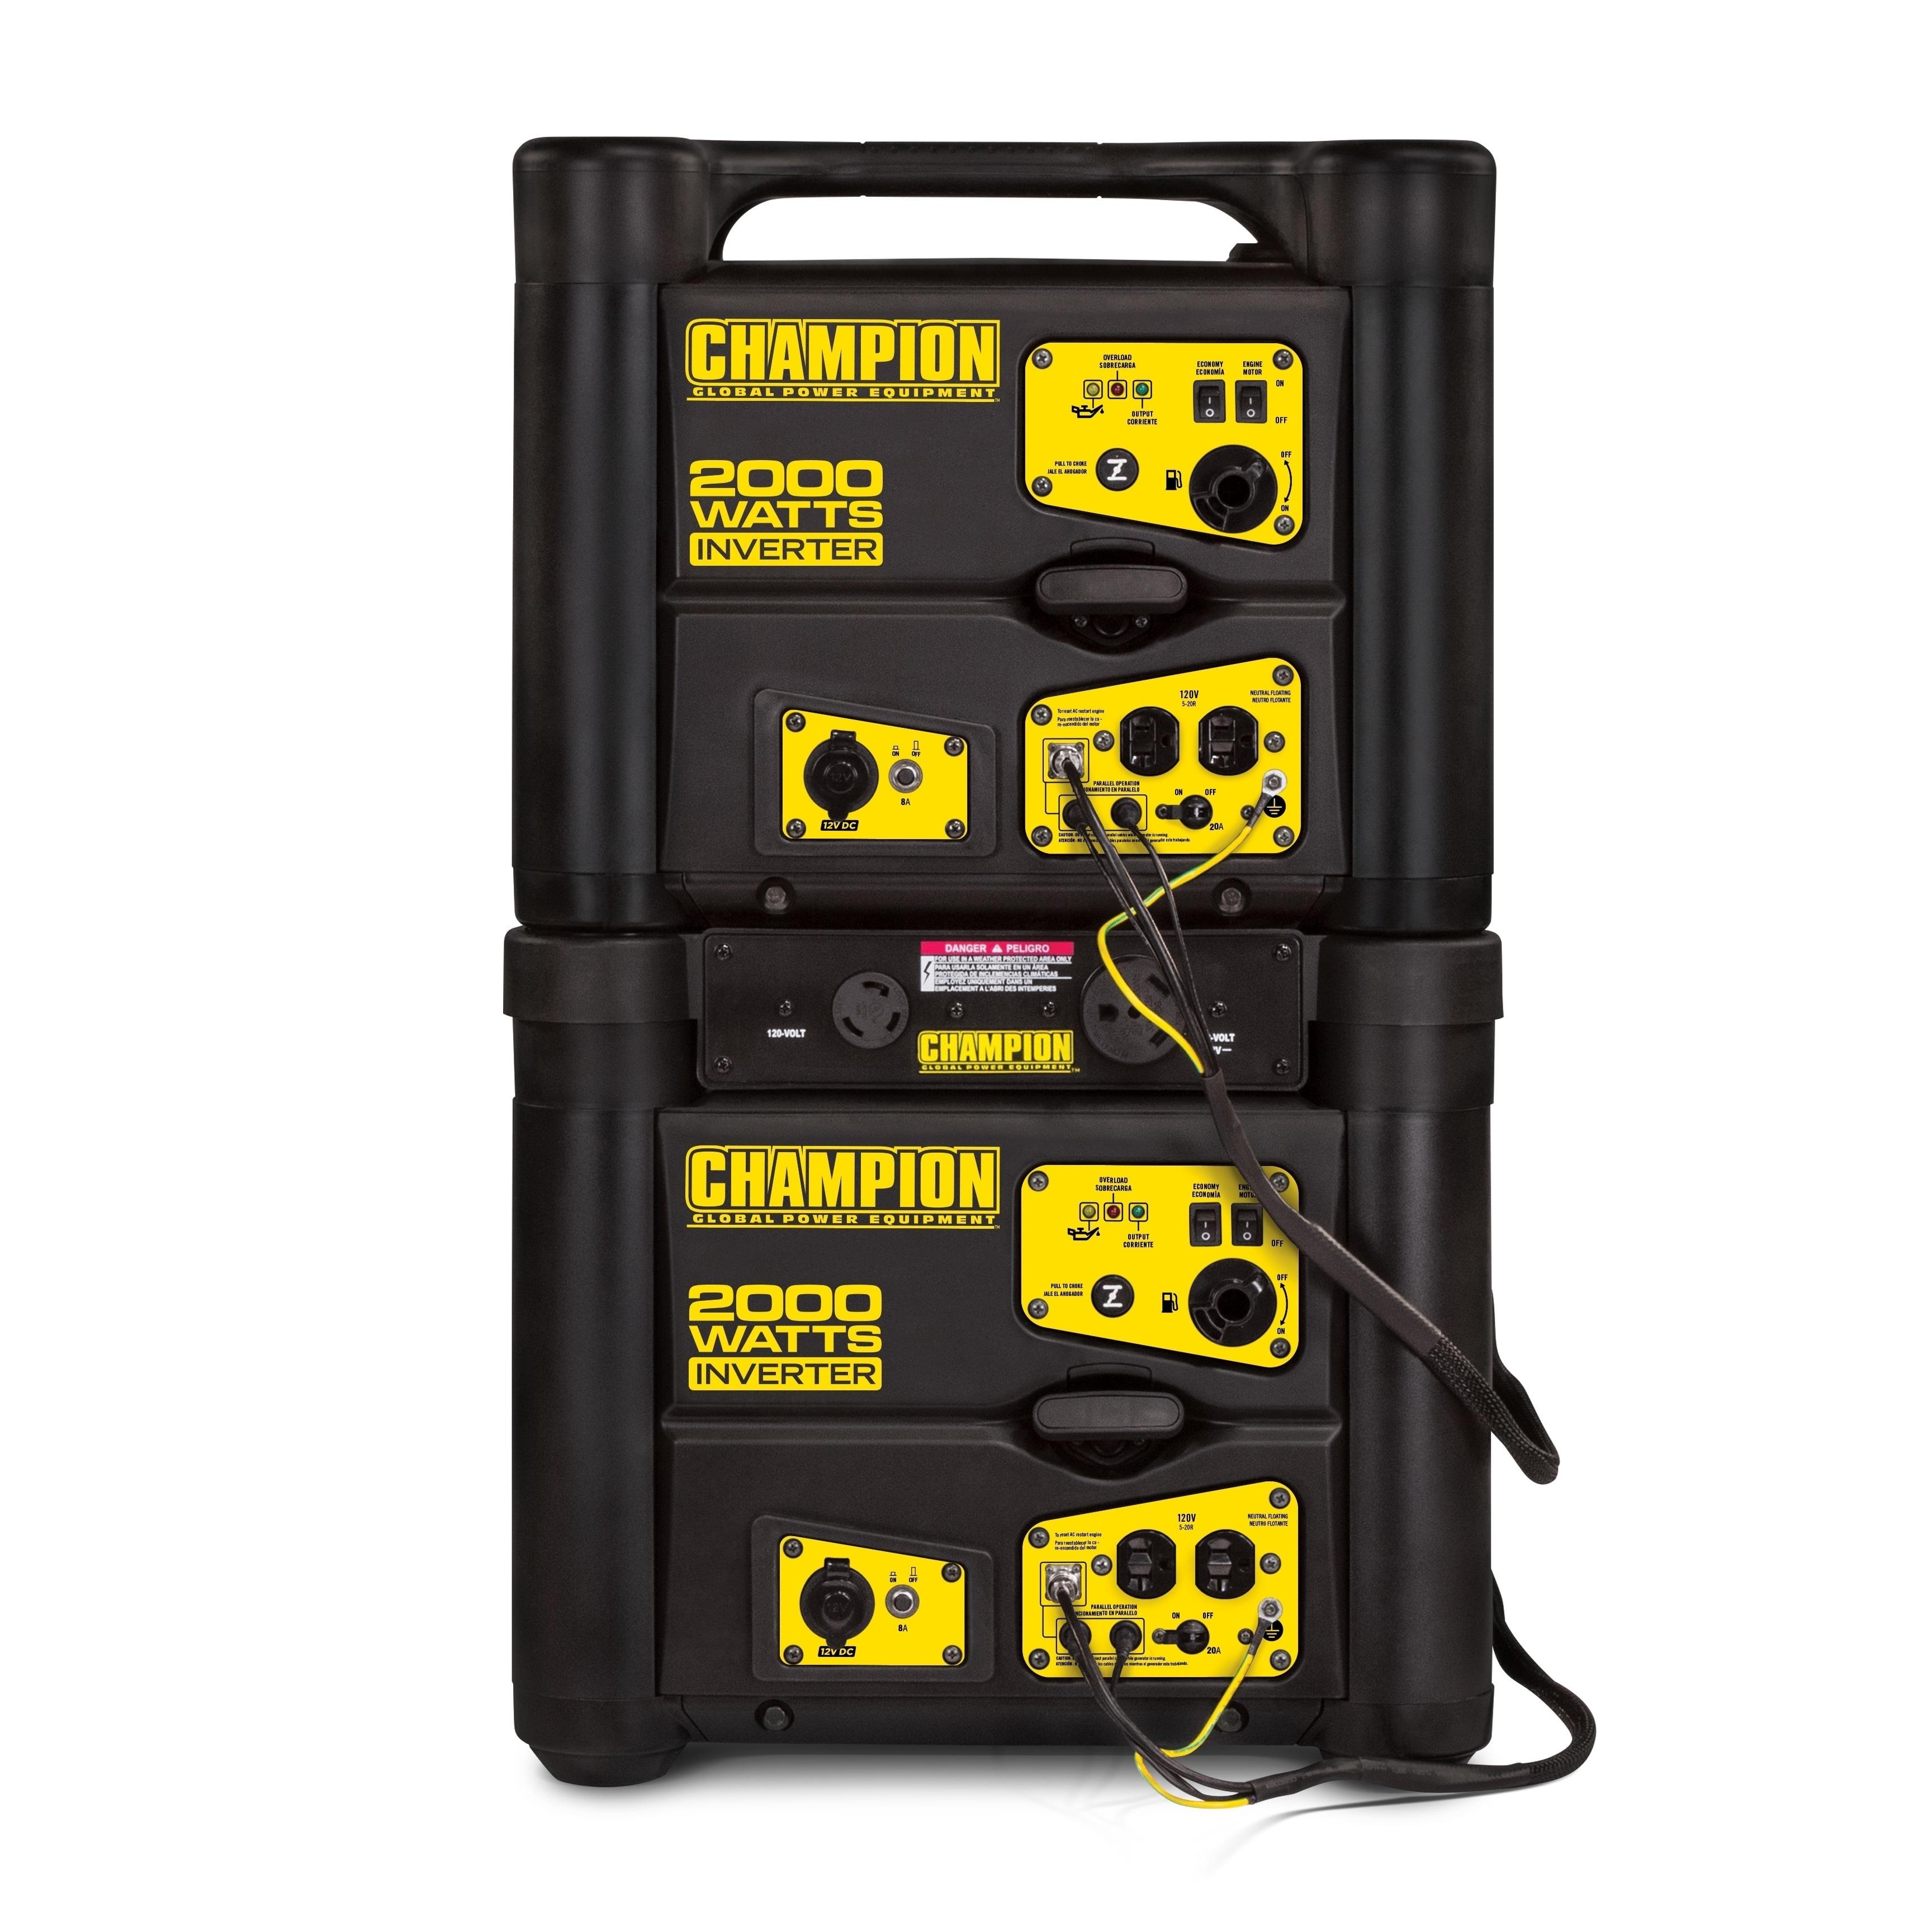 Champion 2000-Watt Stackable Portable Inverter Generator - Black